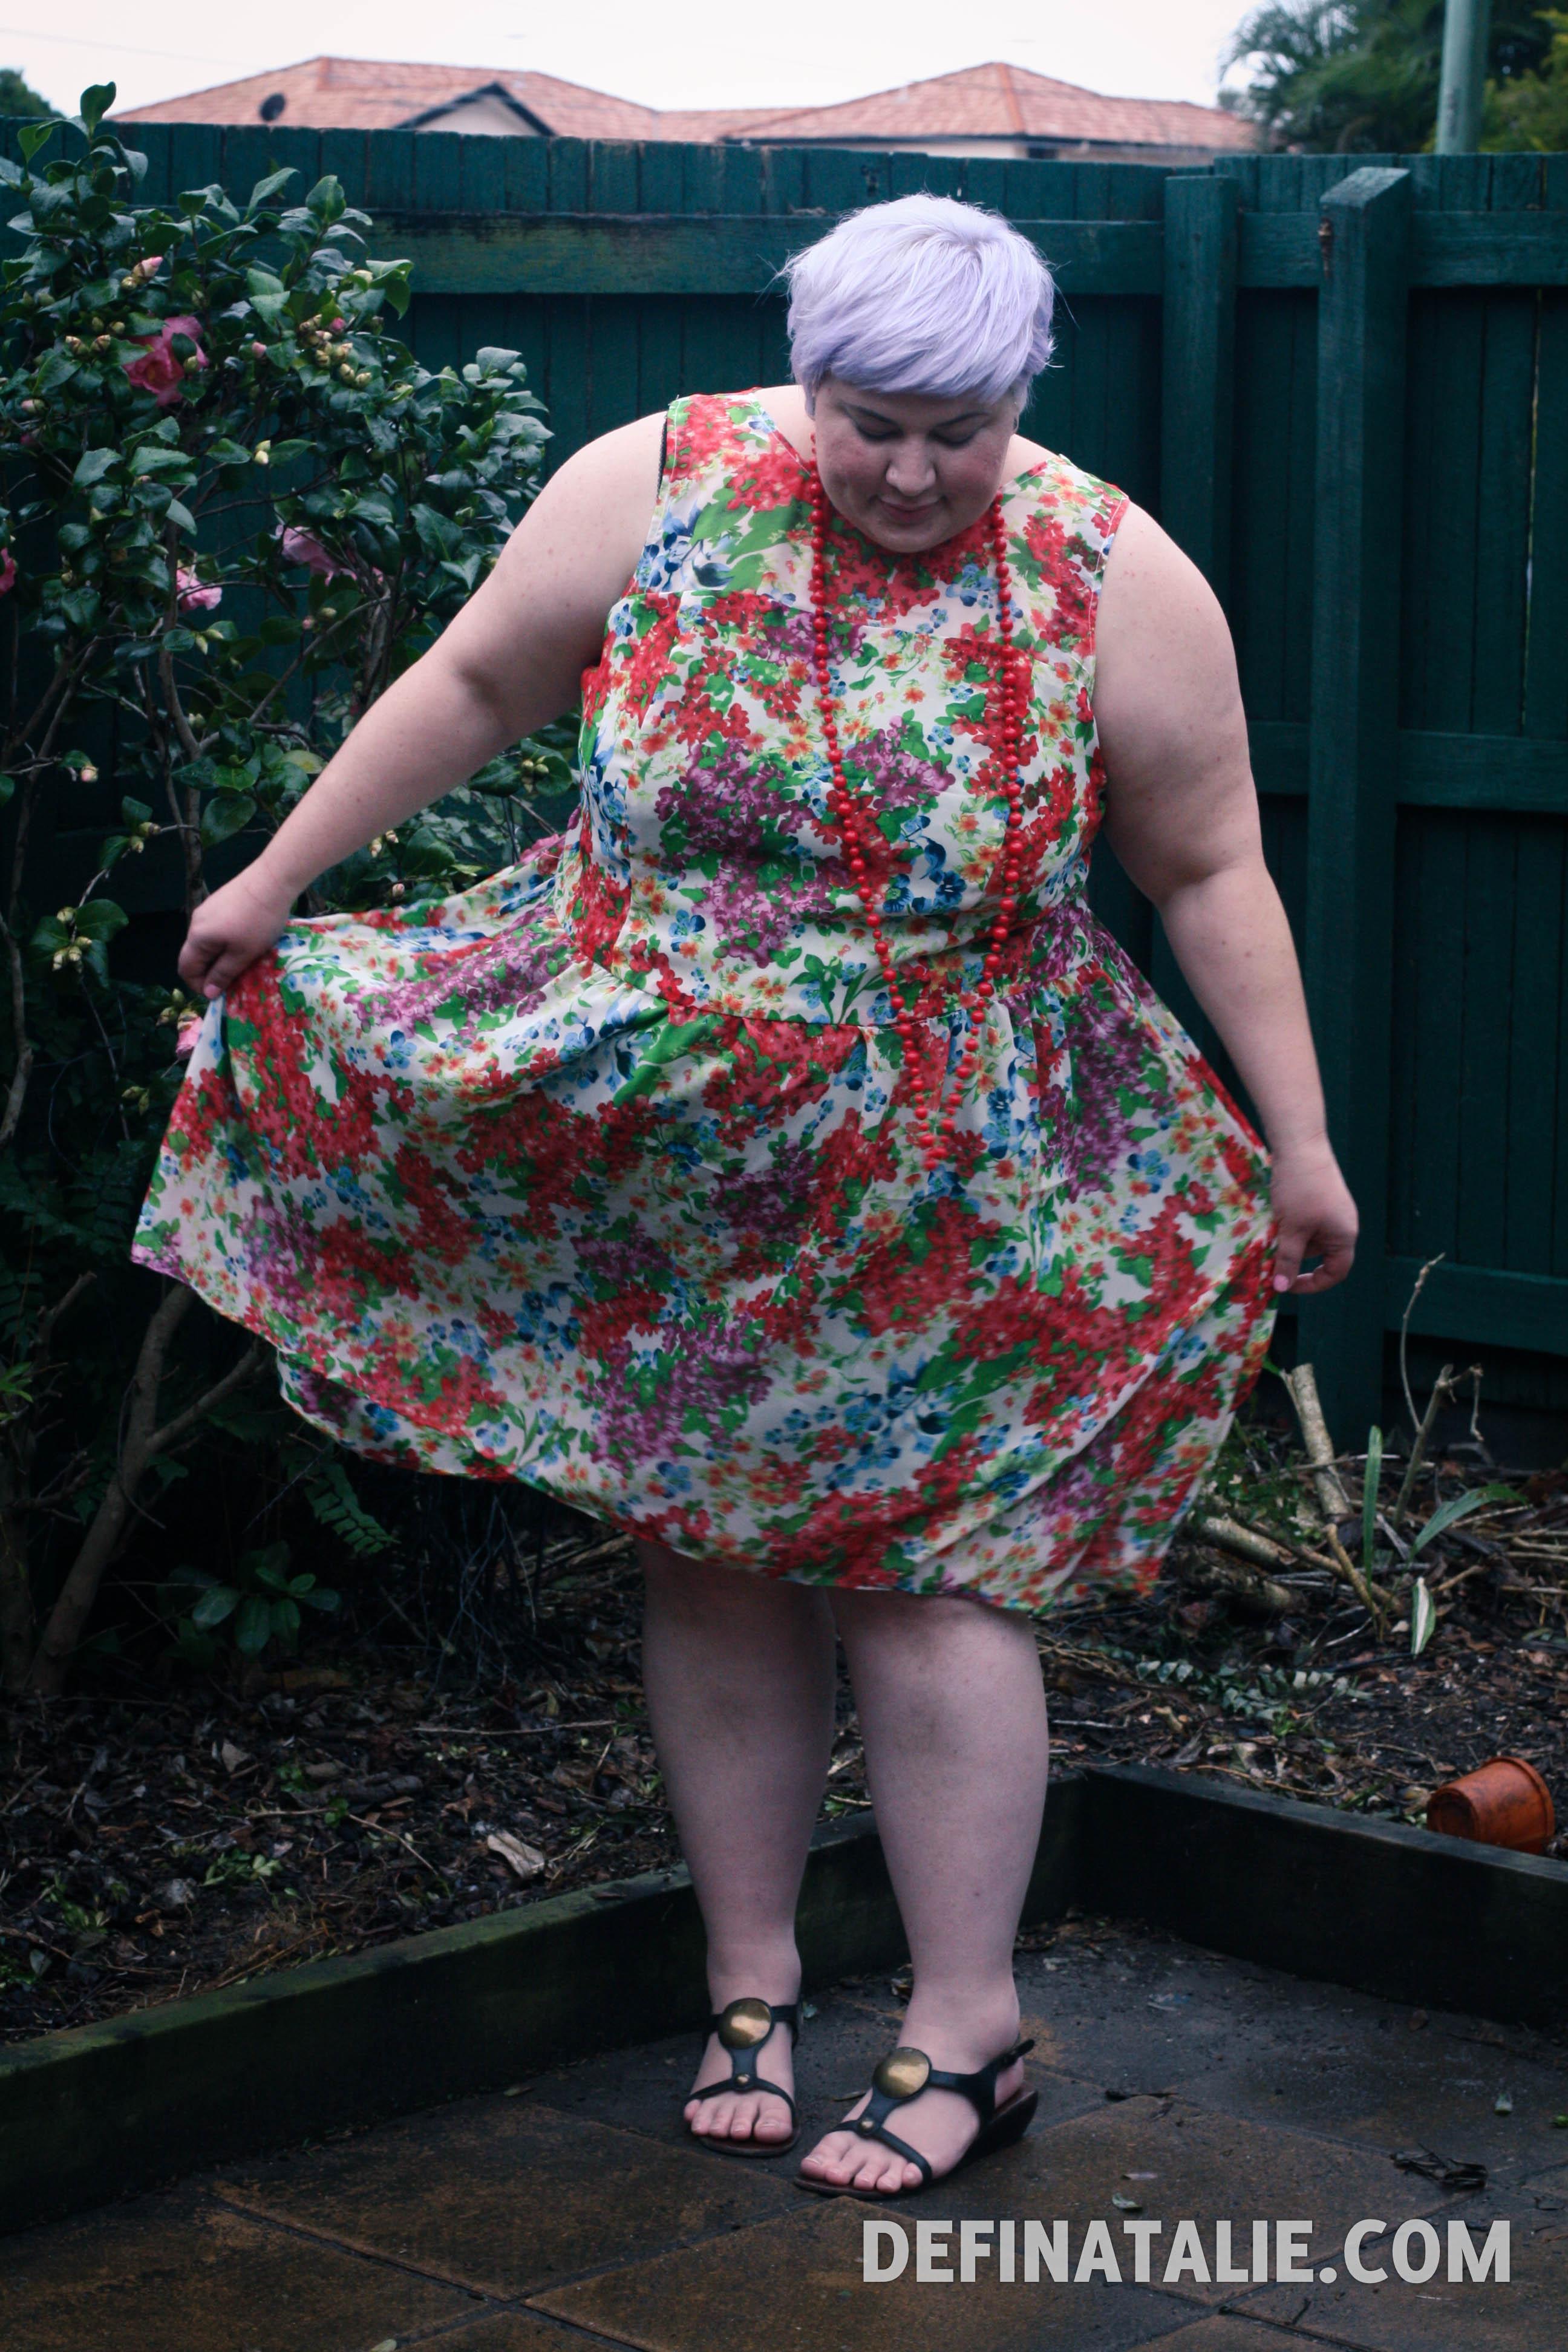 No 3: Floral garden dress!